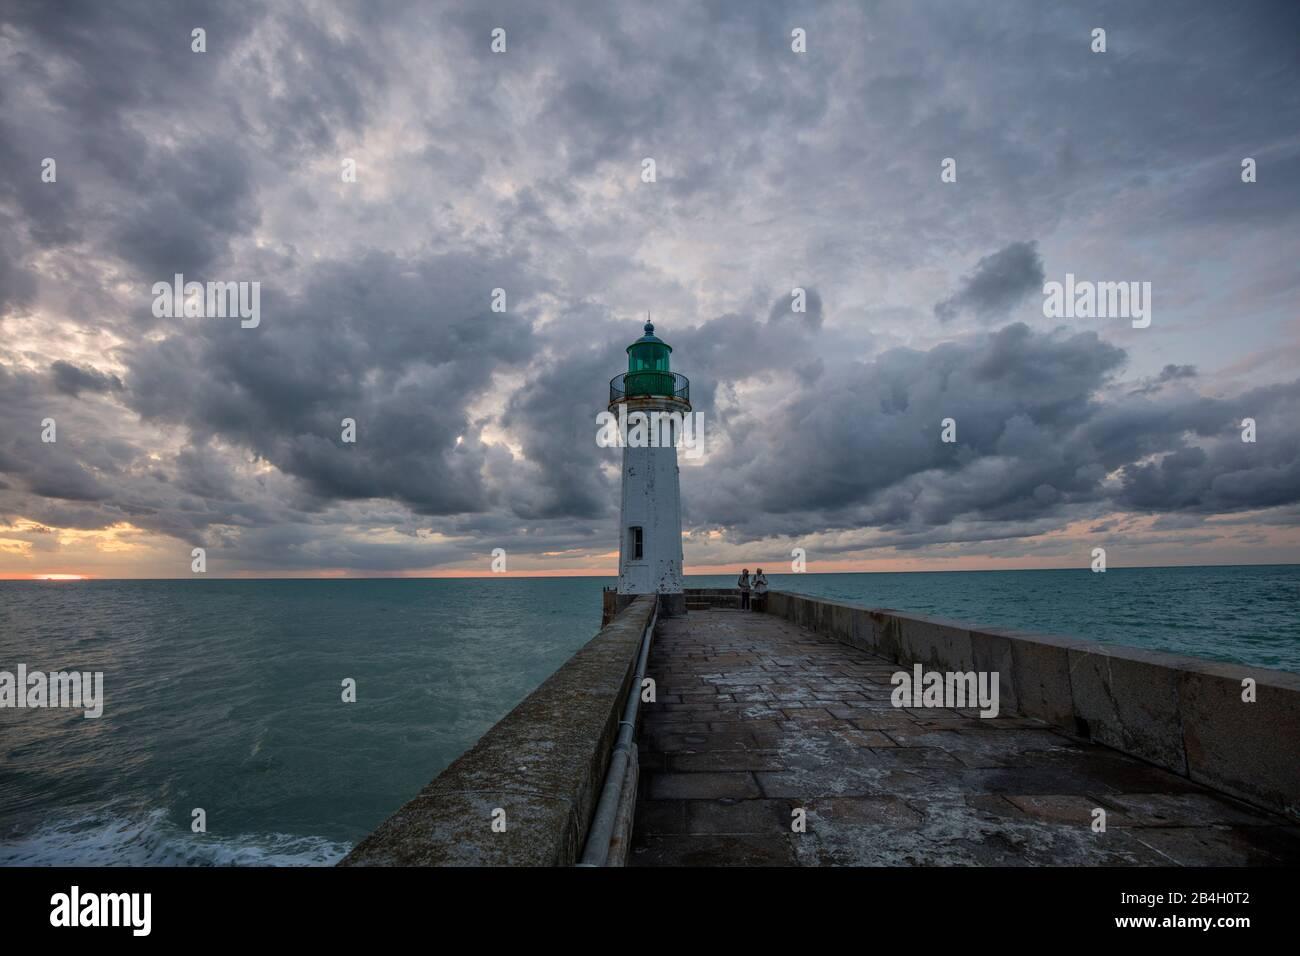 Normandie, Leuchtturm, Wolken, Ärmelkanal, Atlantik Stockfoto